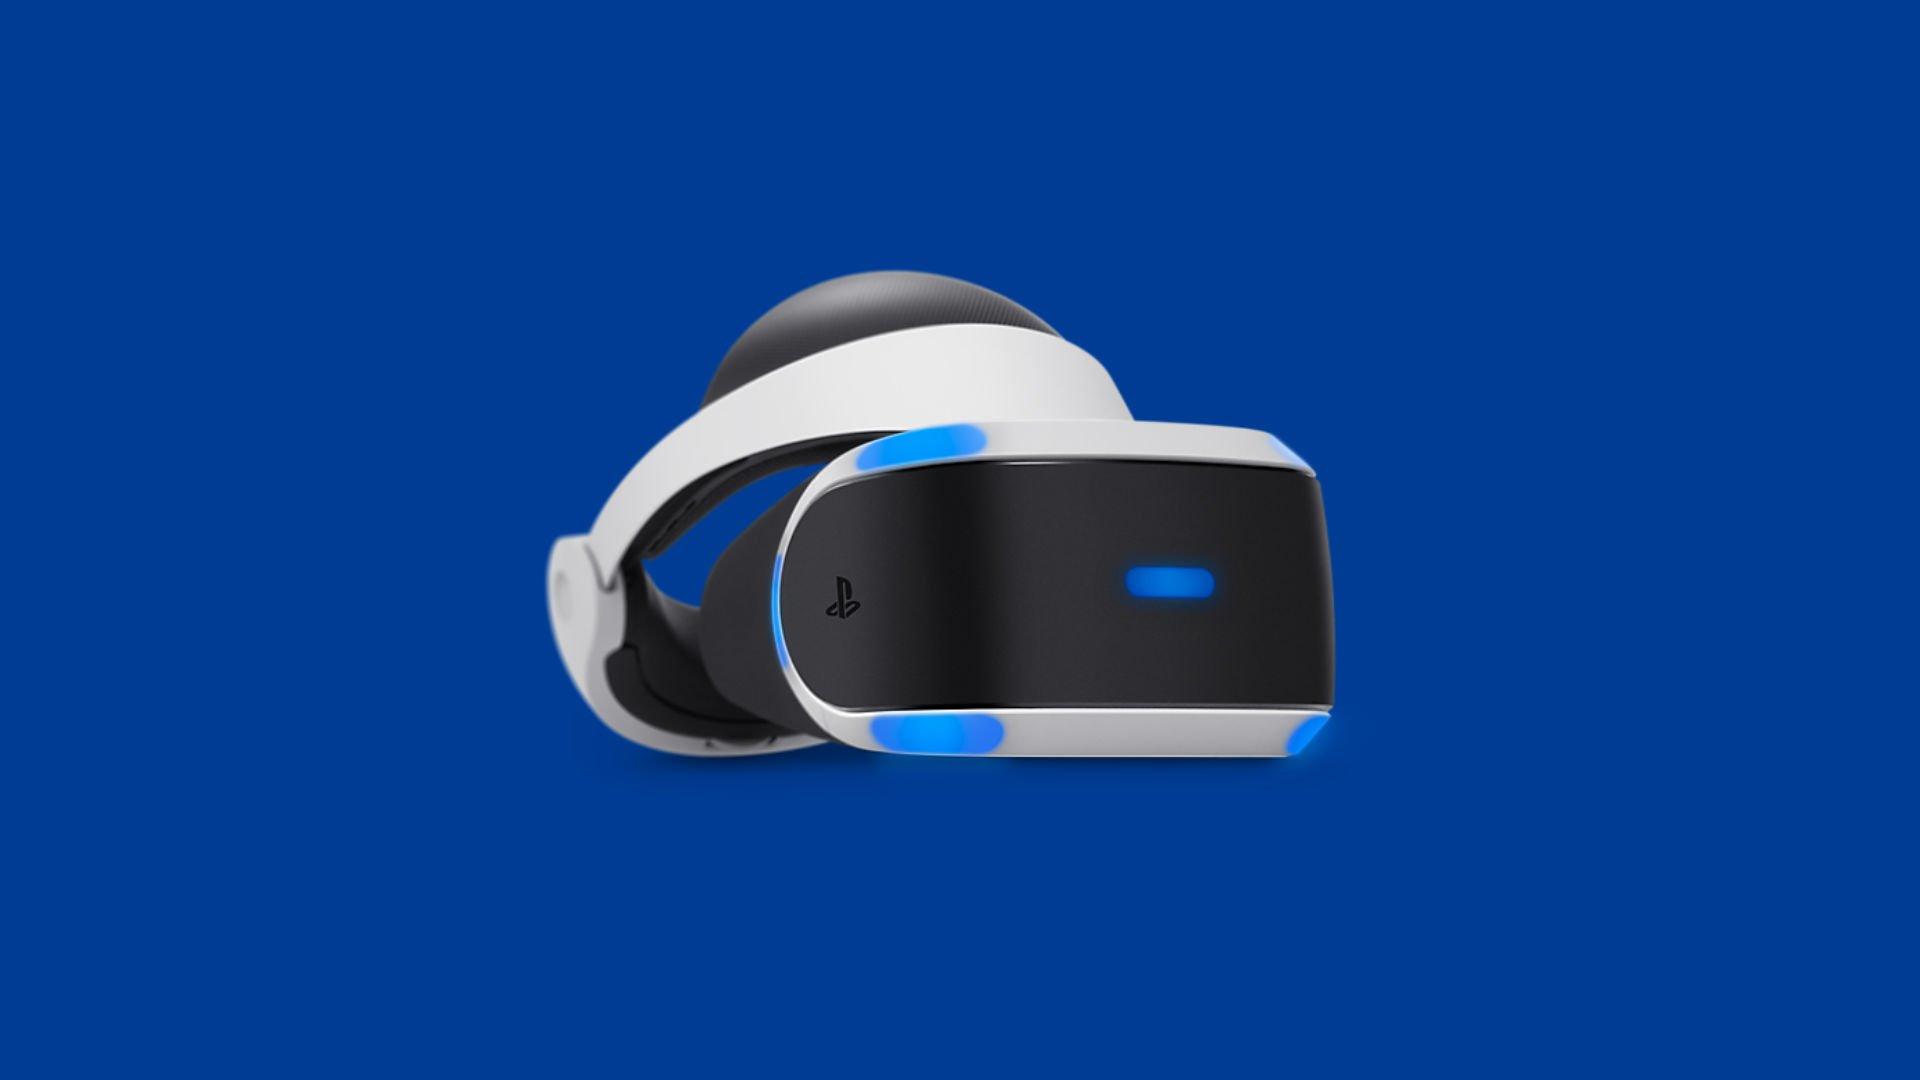 PlayStation VR 2 PSVR PS VR Sony